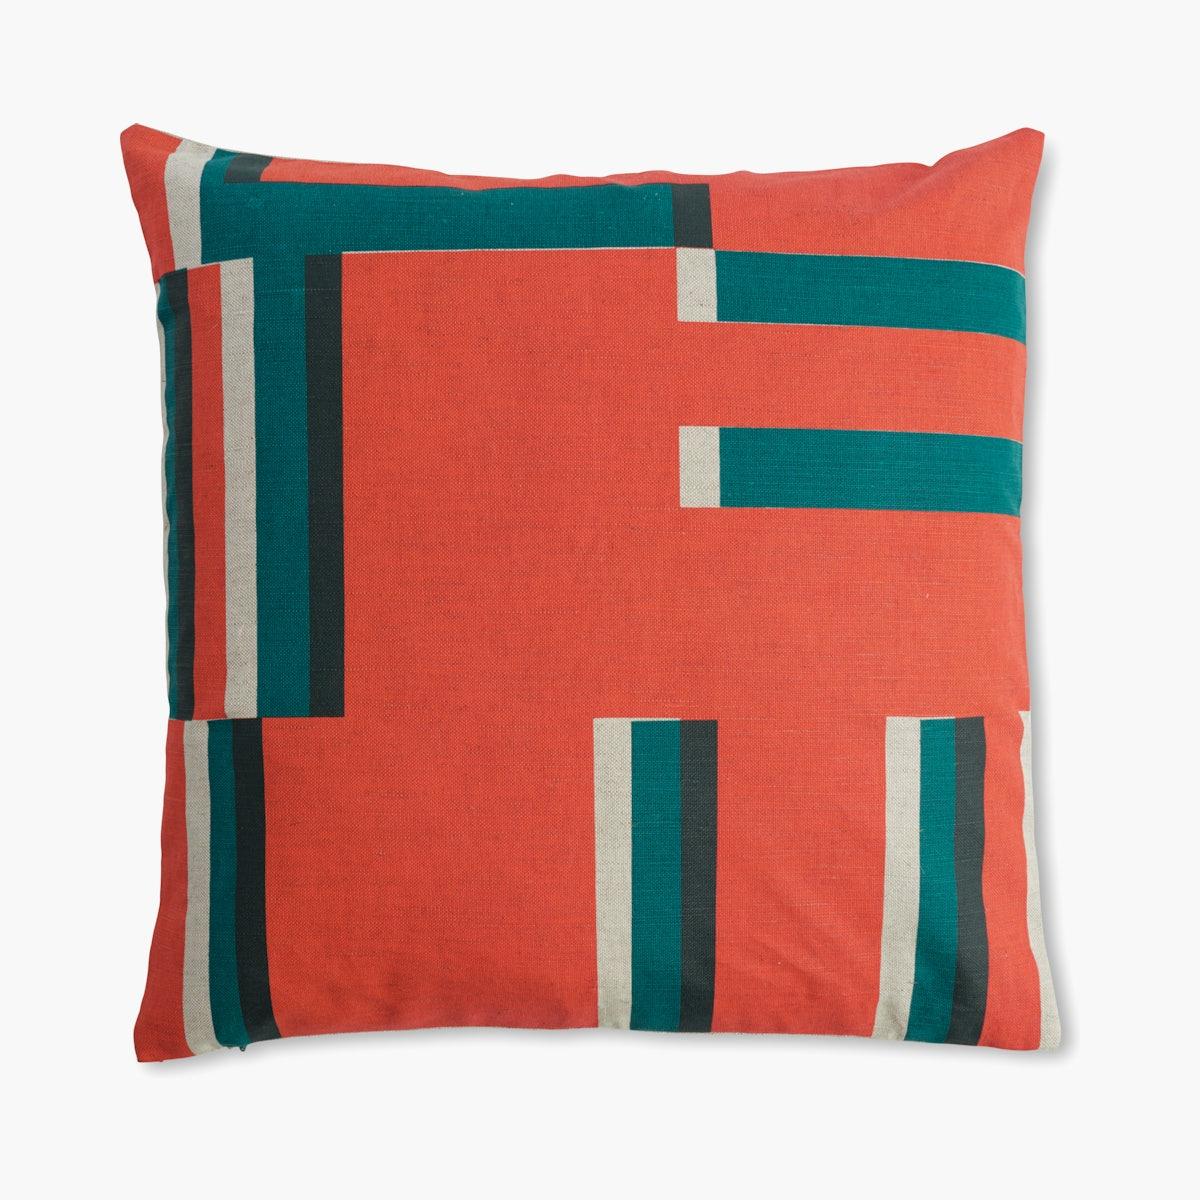 Kasbar Pillow